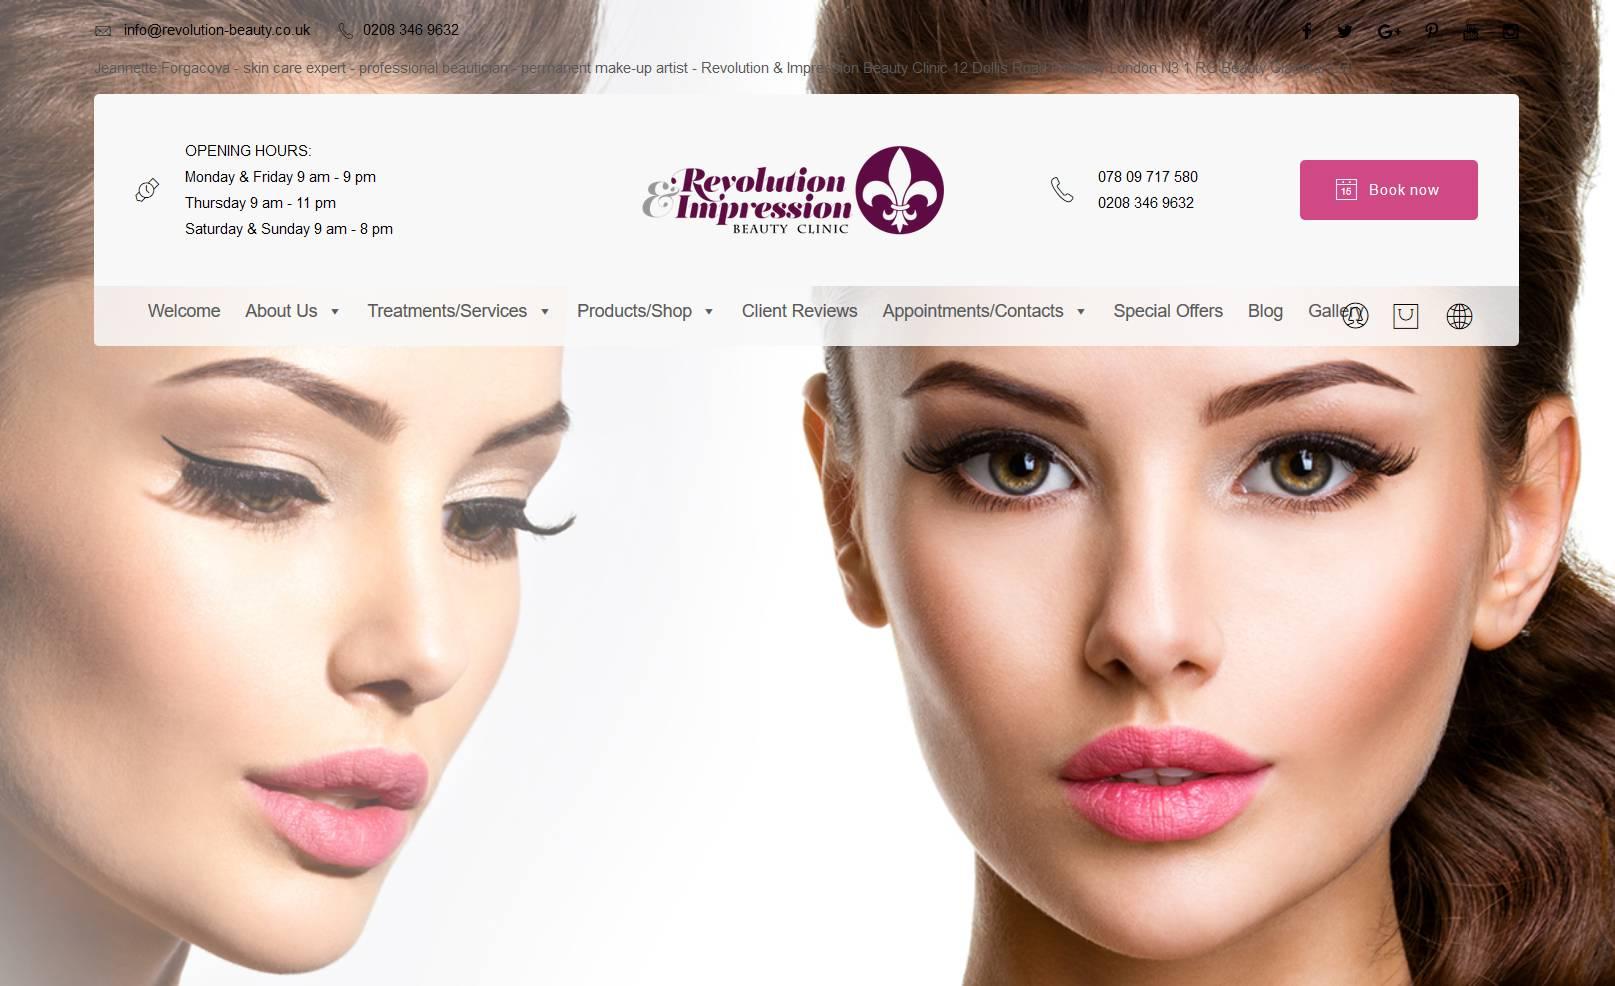 Beauty Clinic Banner Image 3 Hubert Creative Studio